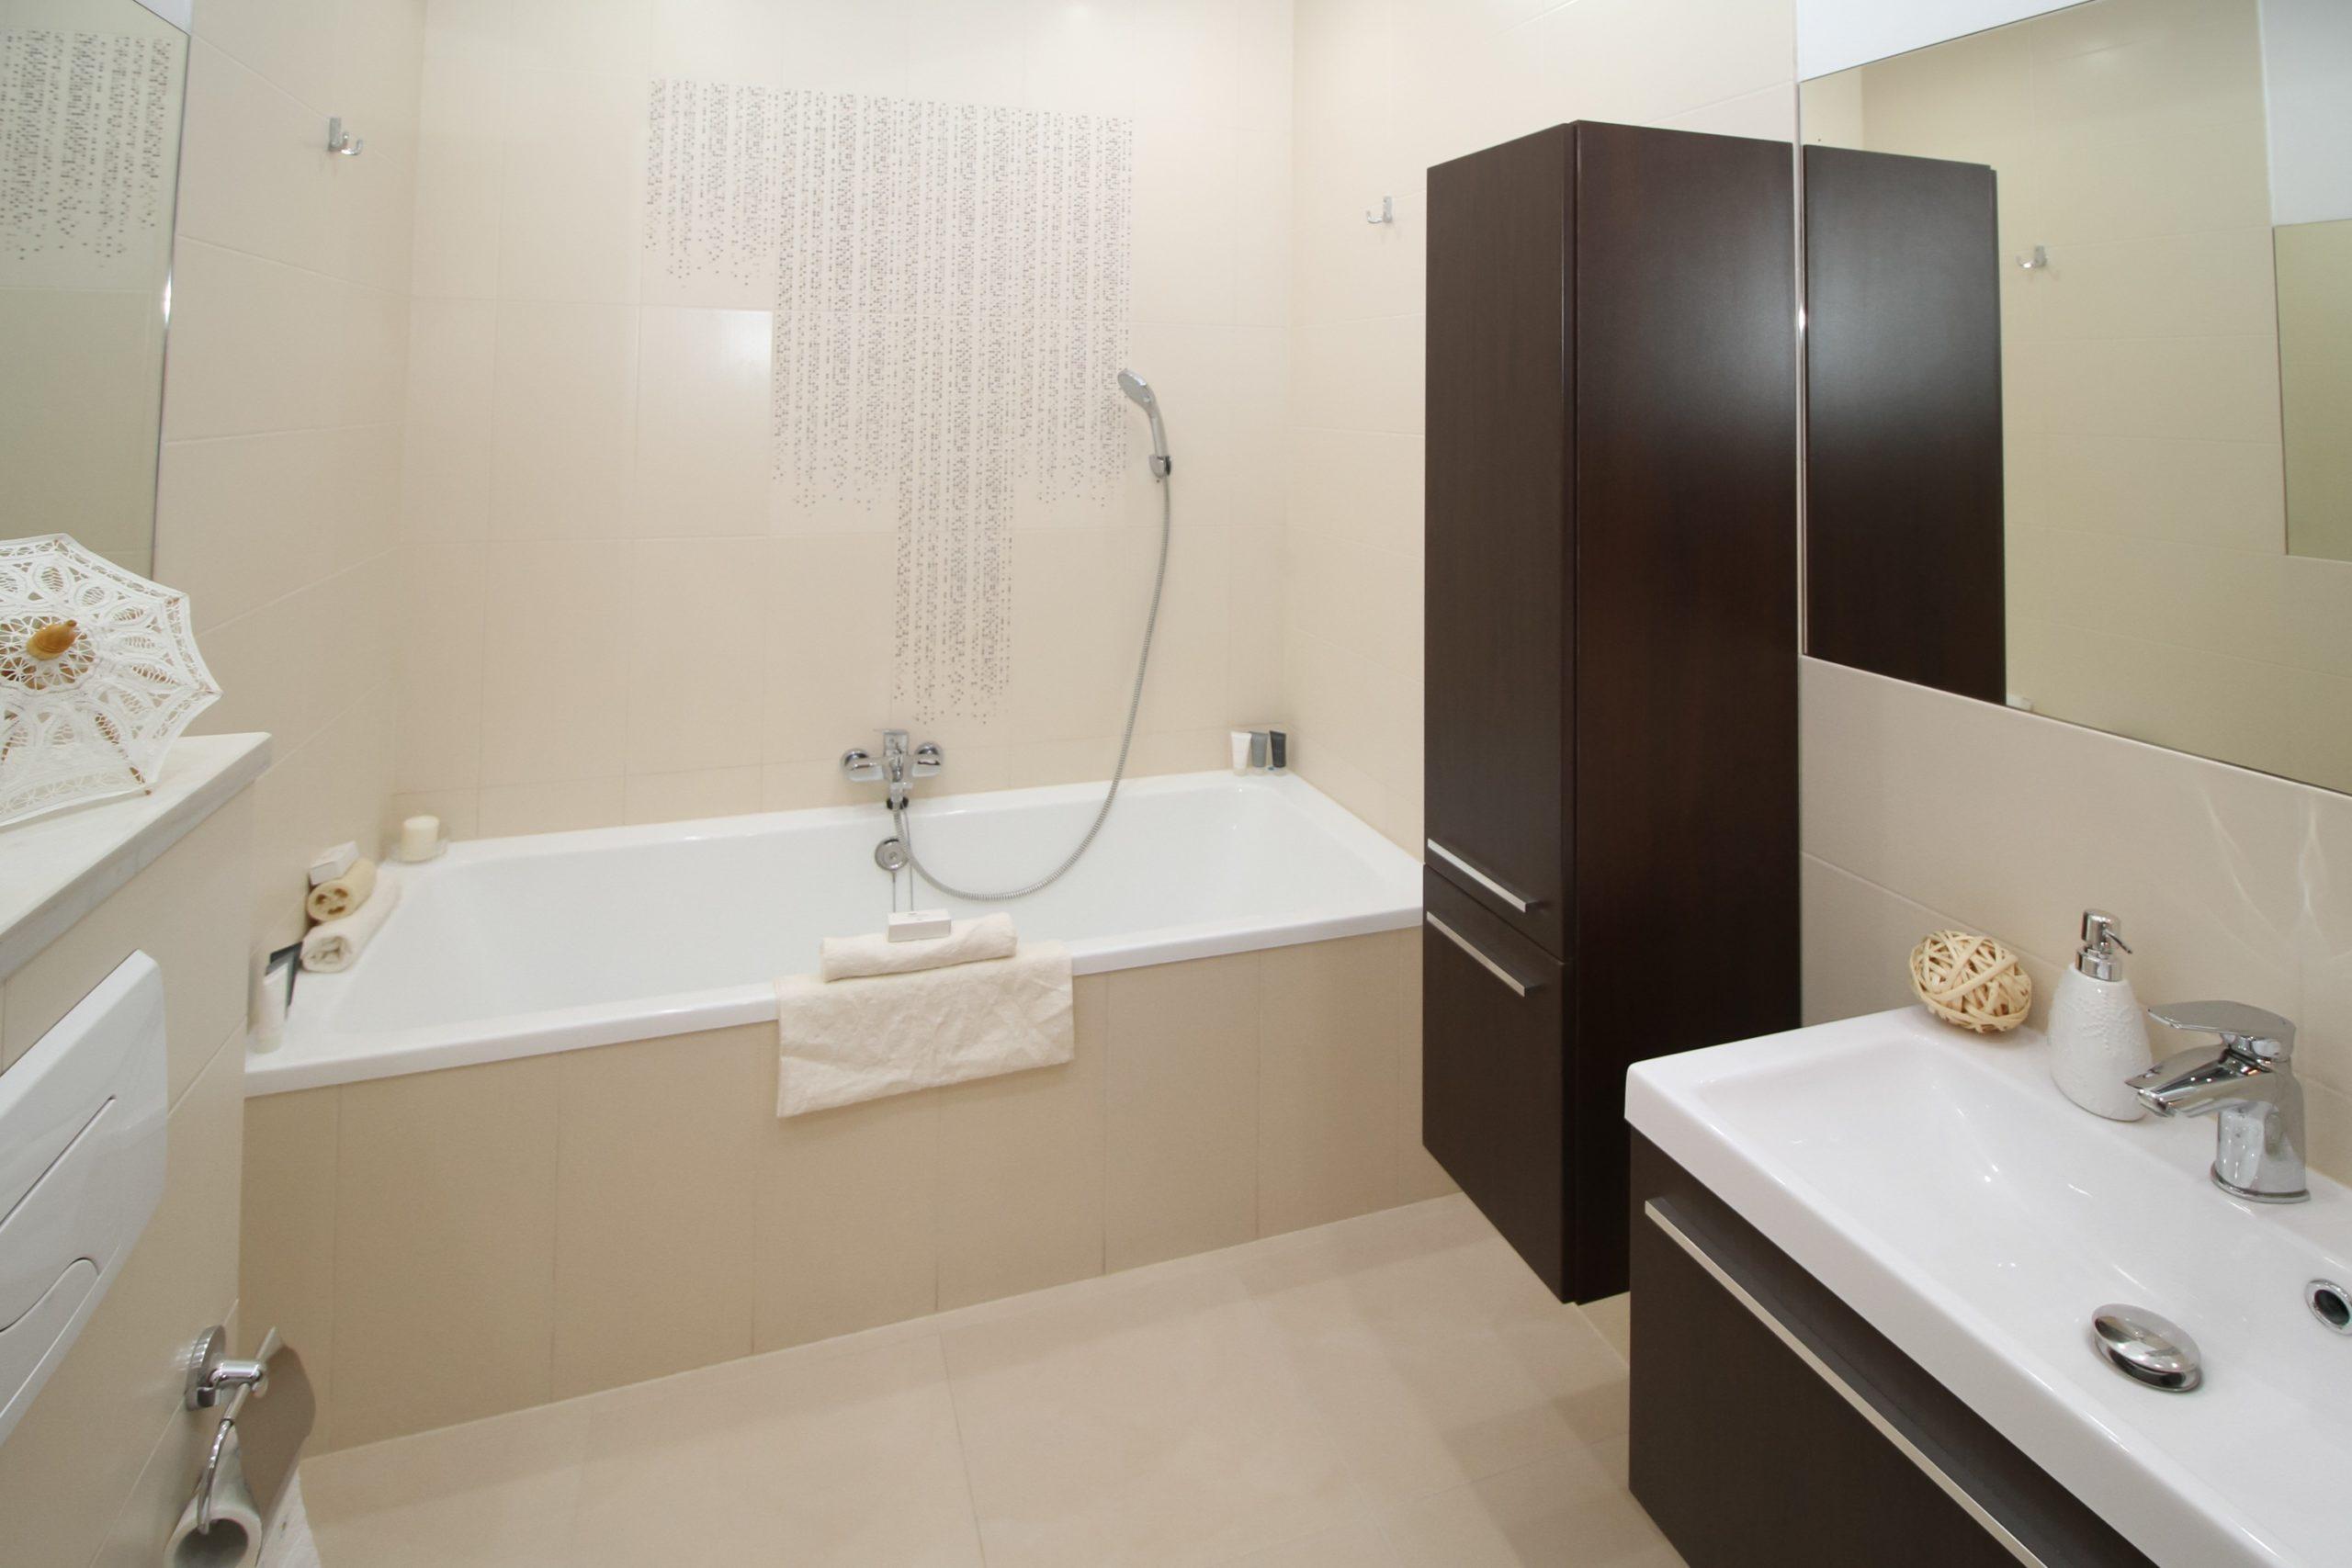 Bathroom 2094735 Scaled